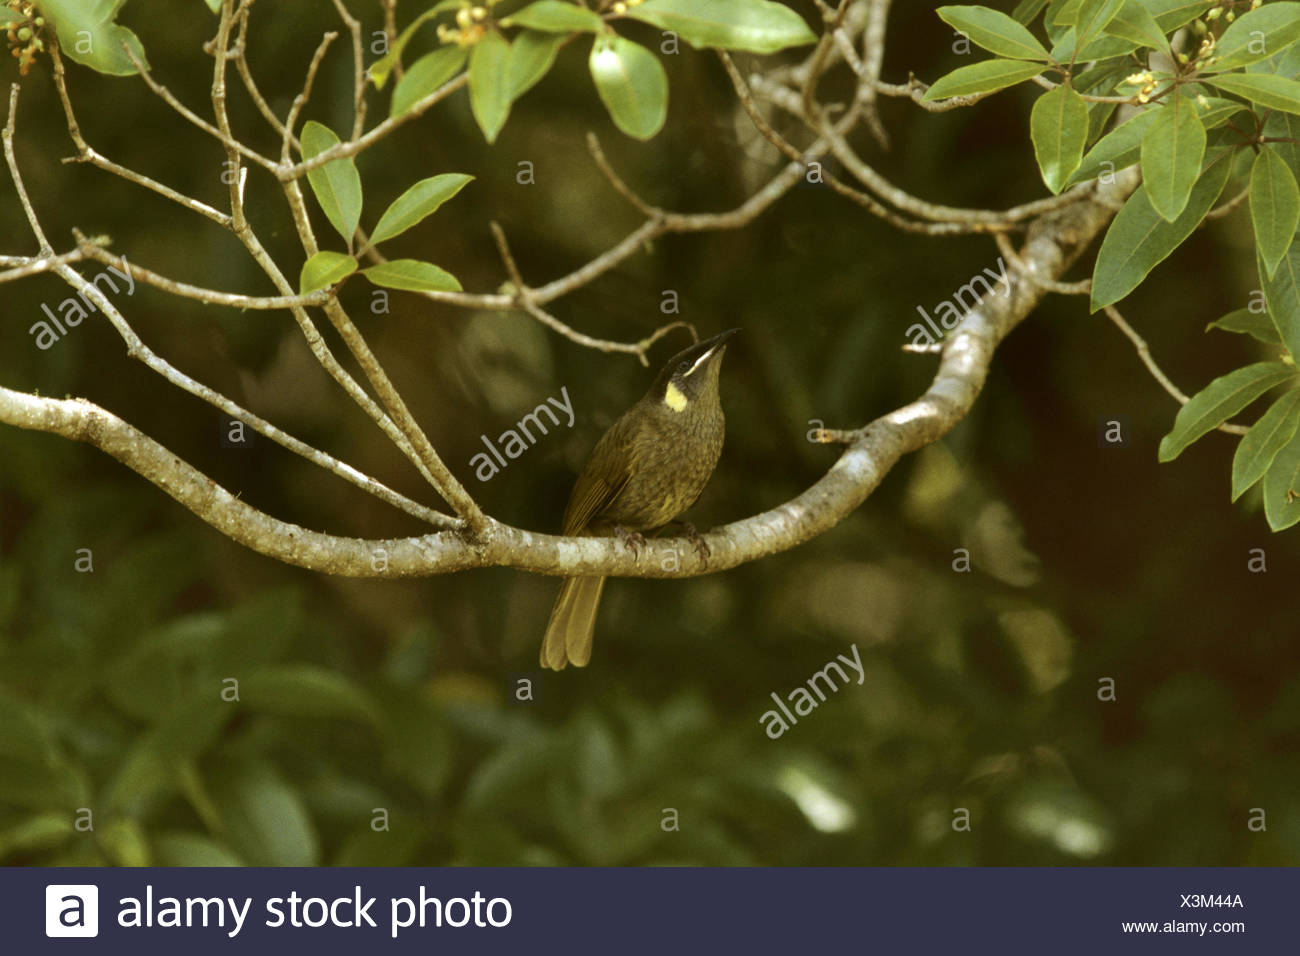 lewin honeyeater (Meliphaga lewinii), on a branch - Stock Image